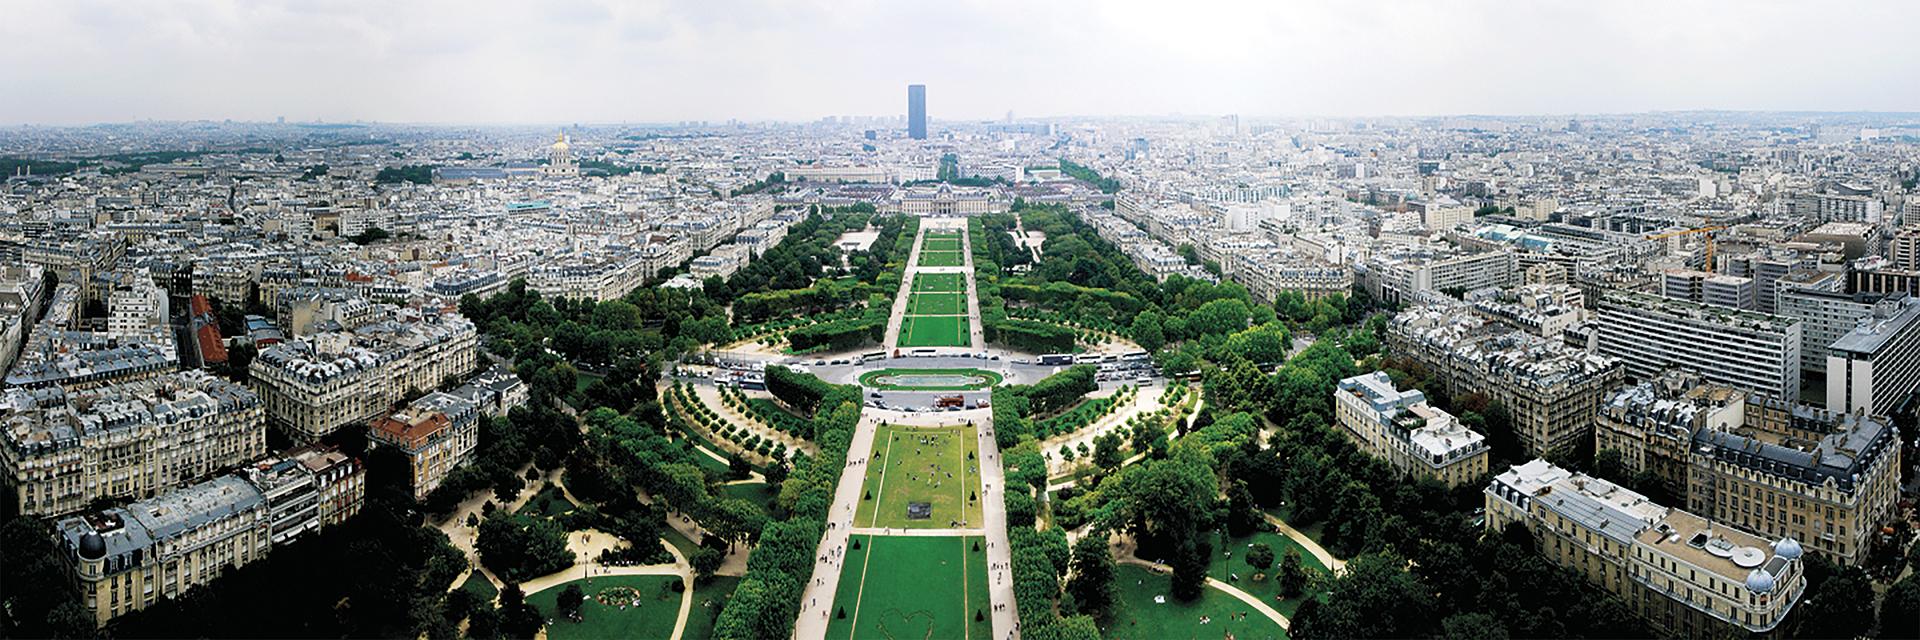 ADEKWA Avocats - Paris 2024